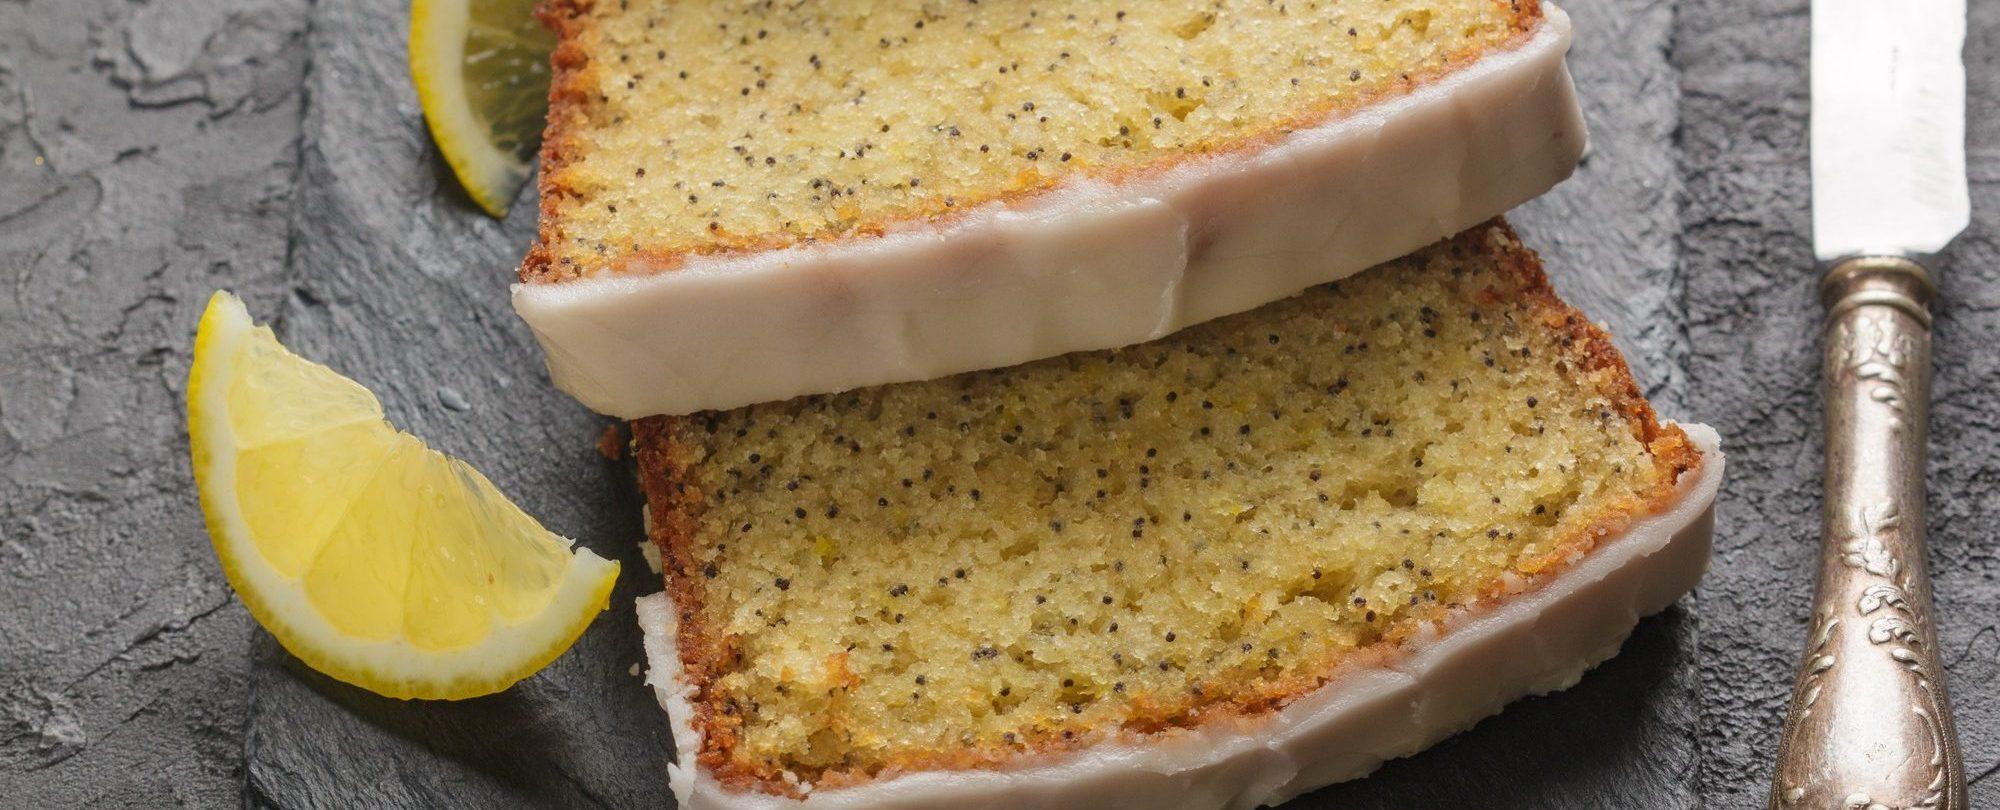 Milo's Lemonade Poppy Seed Pound Cake